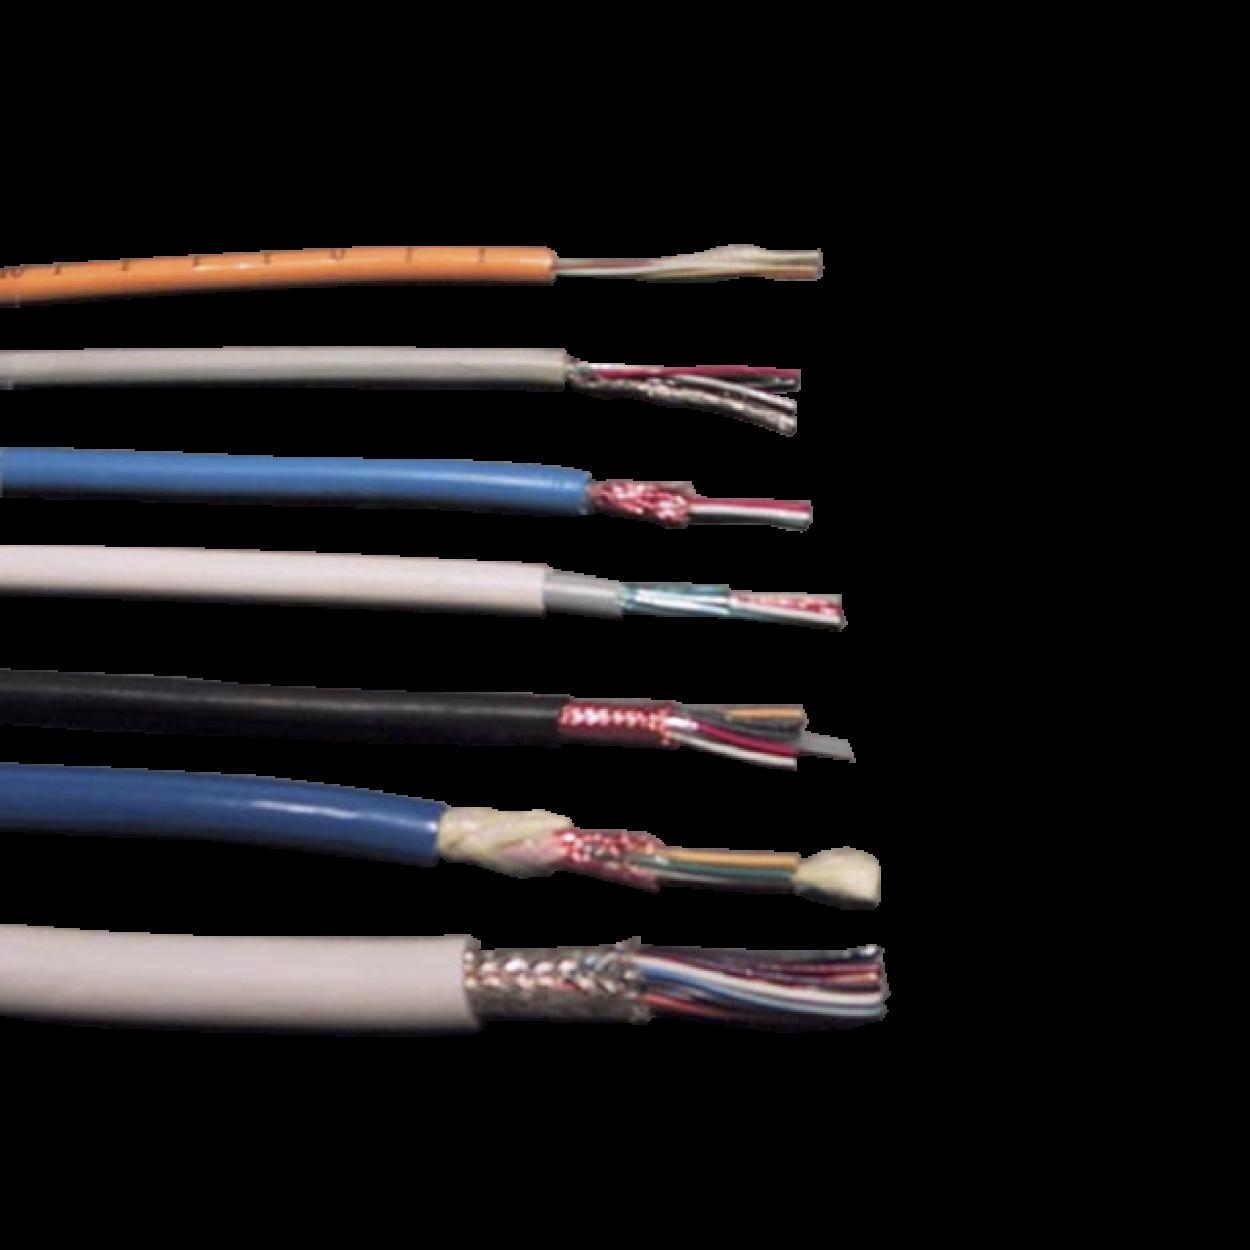 CB_cables